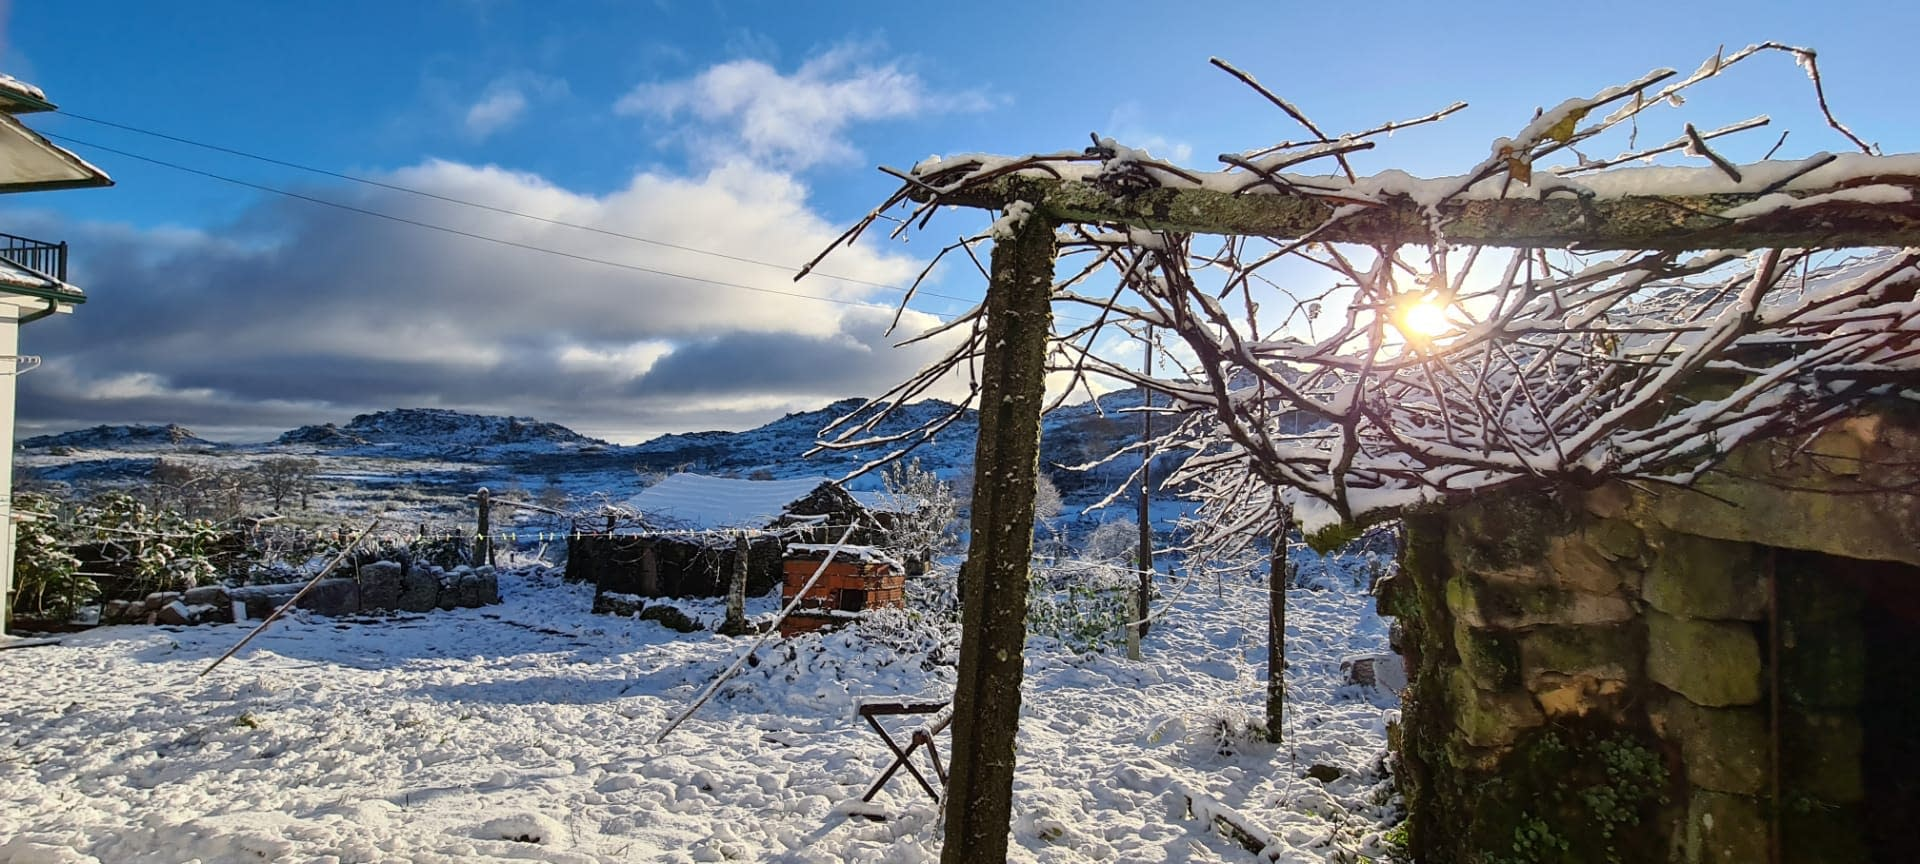 Paisagem da Serra coberta de neve